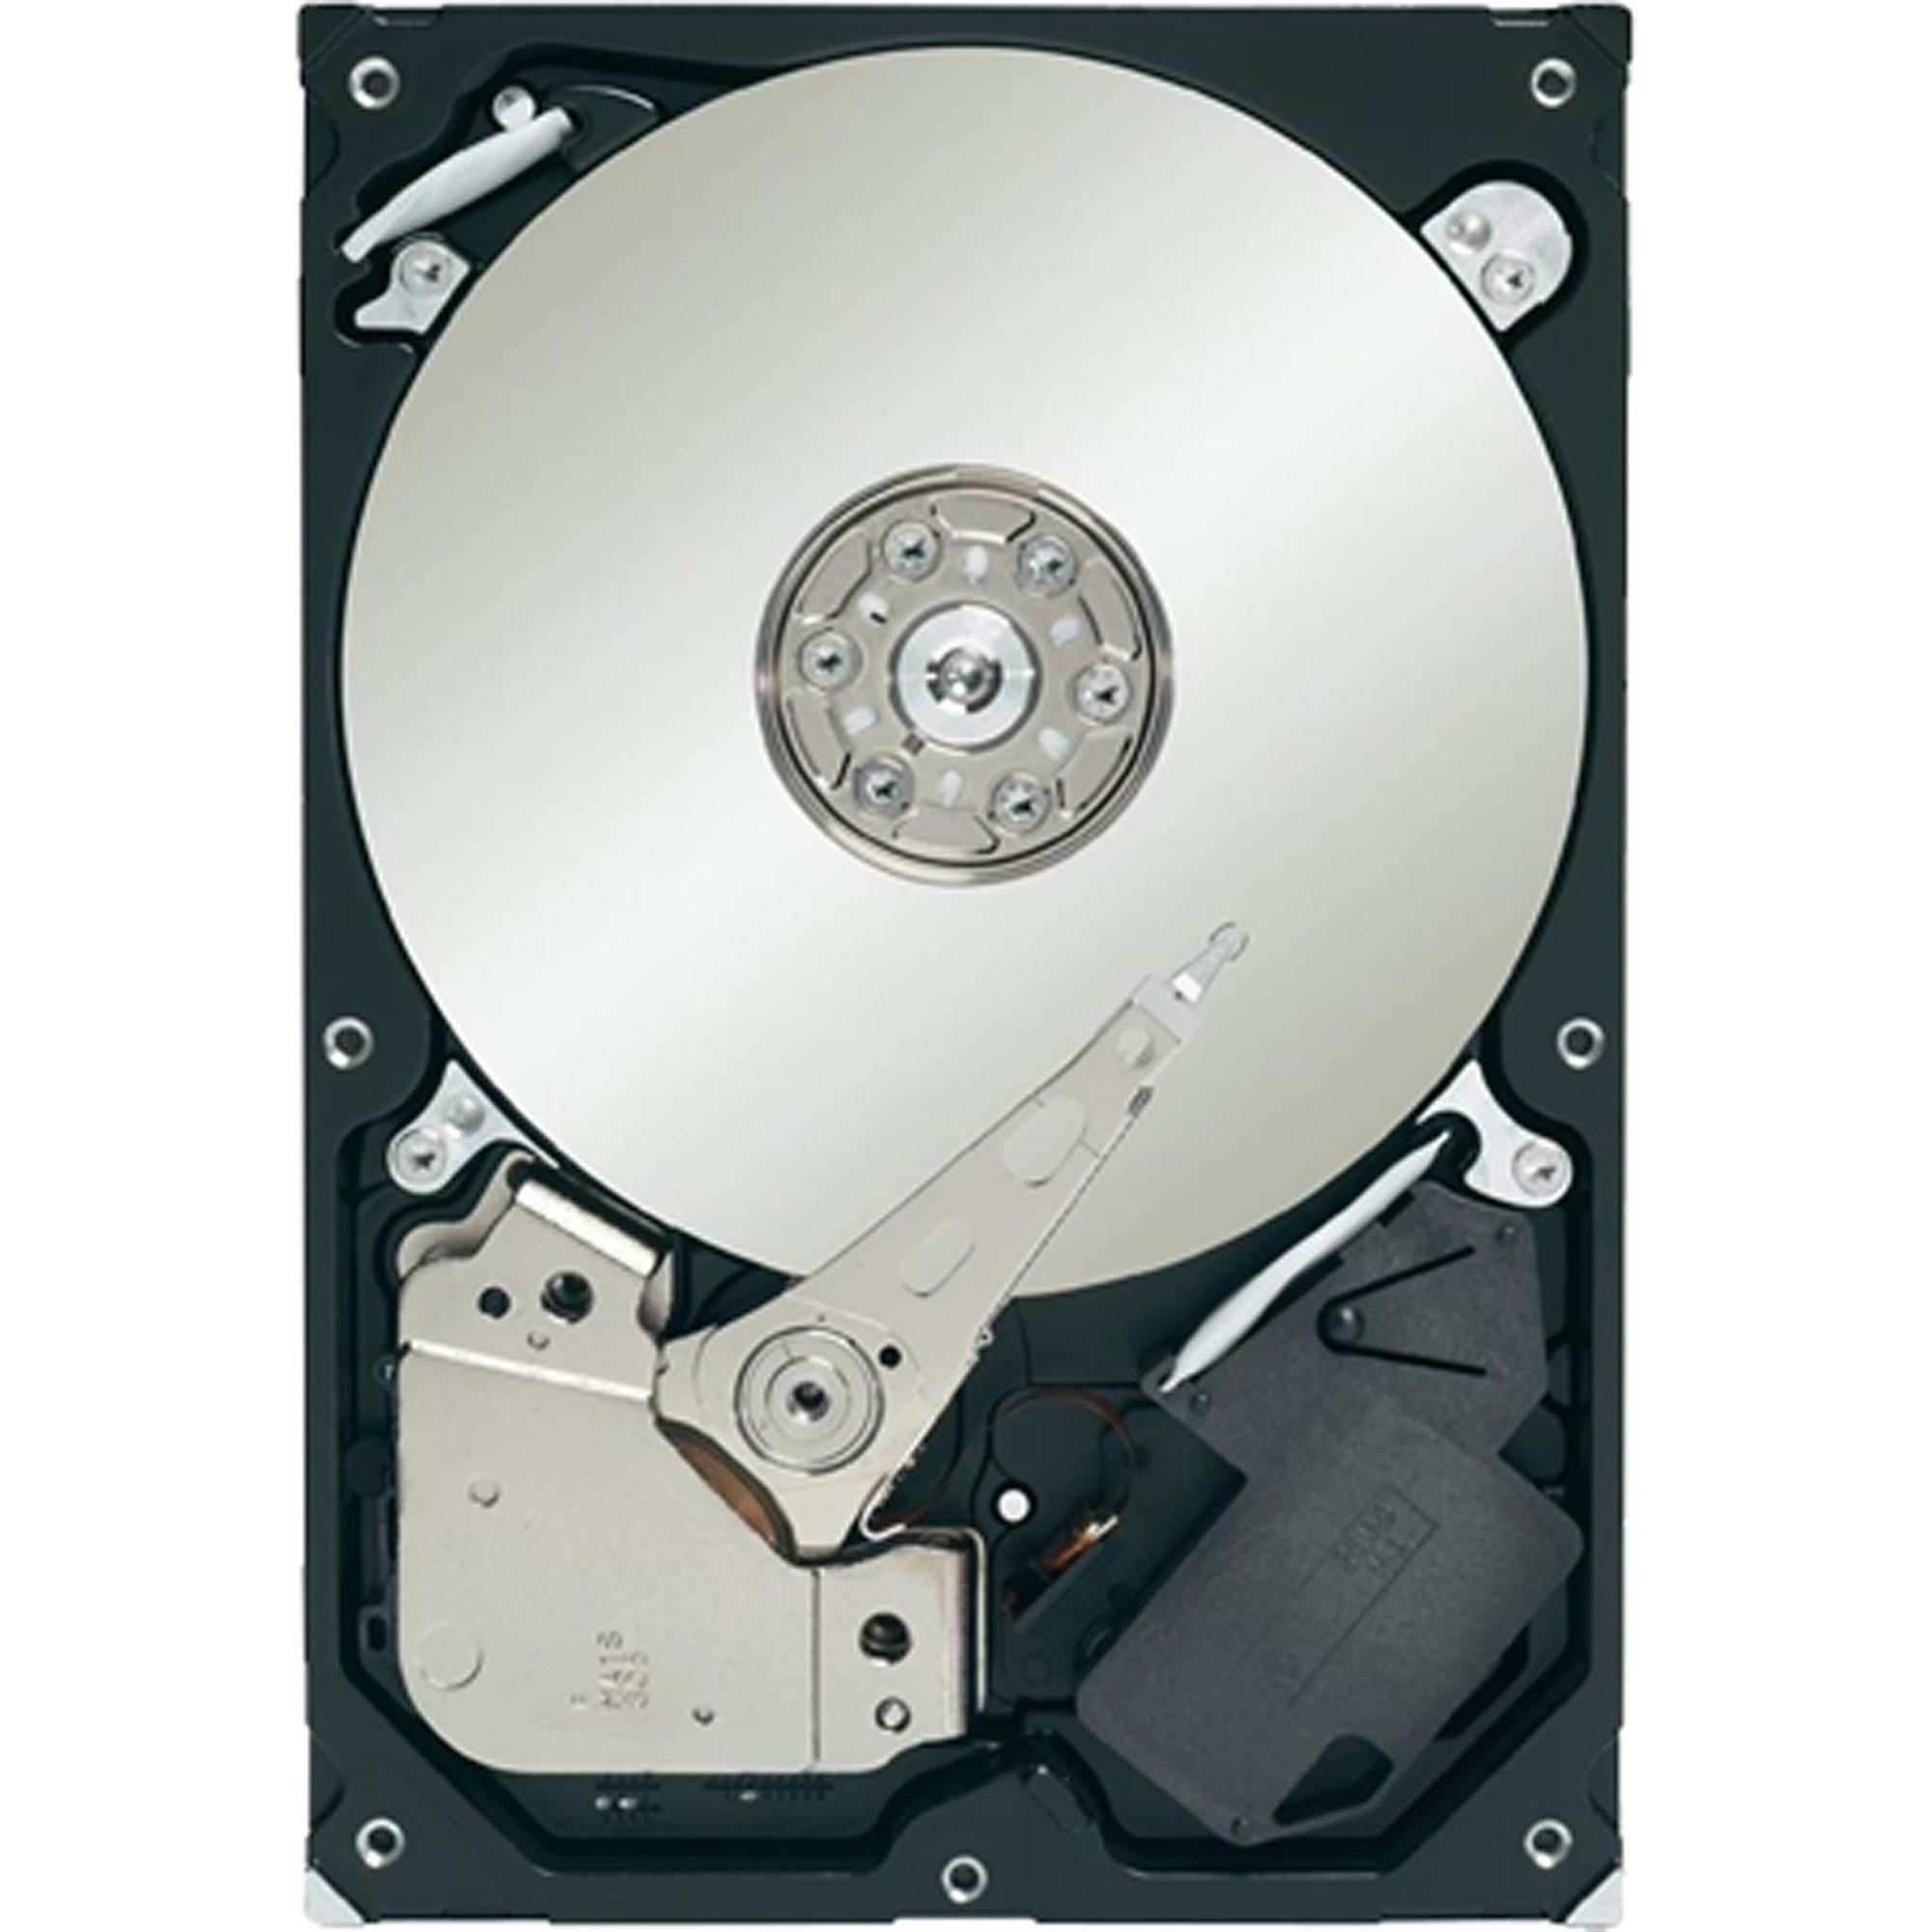 Seagate Festplatte »ST2000VX000 2 TB«